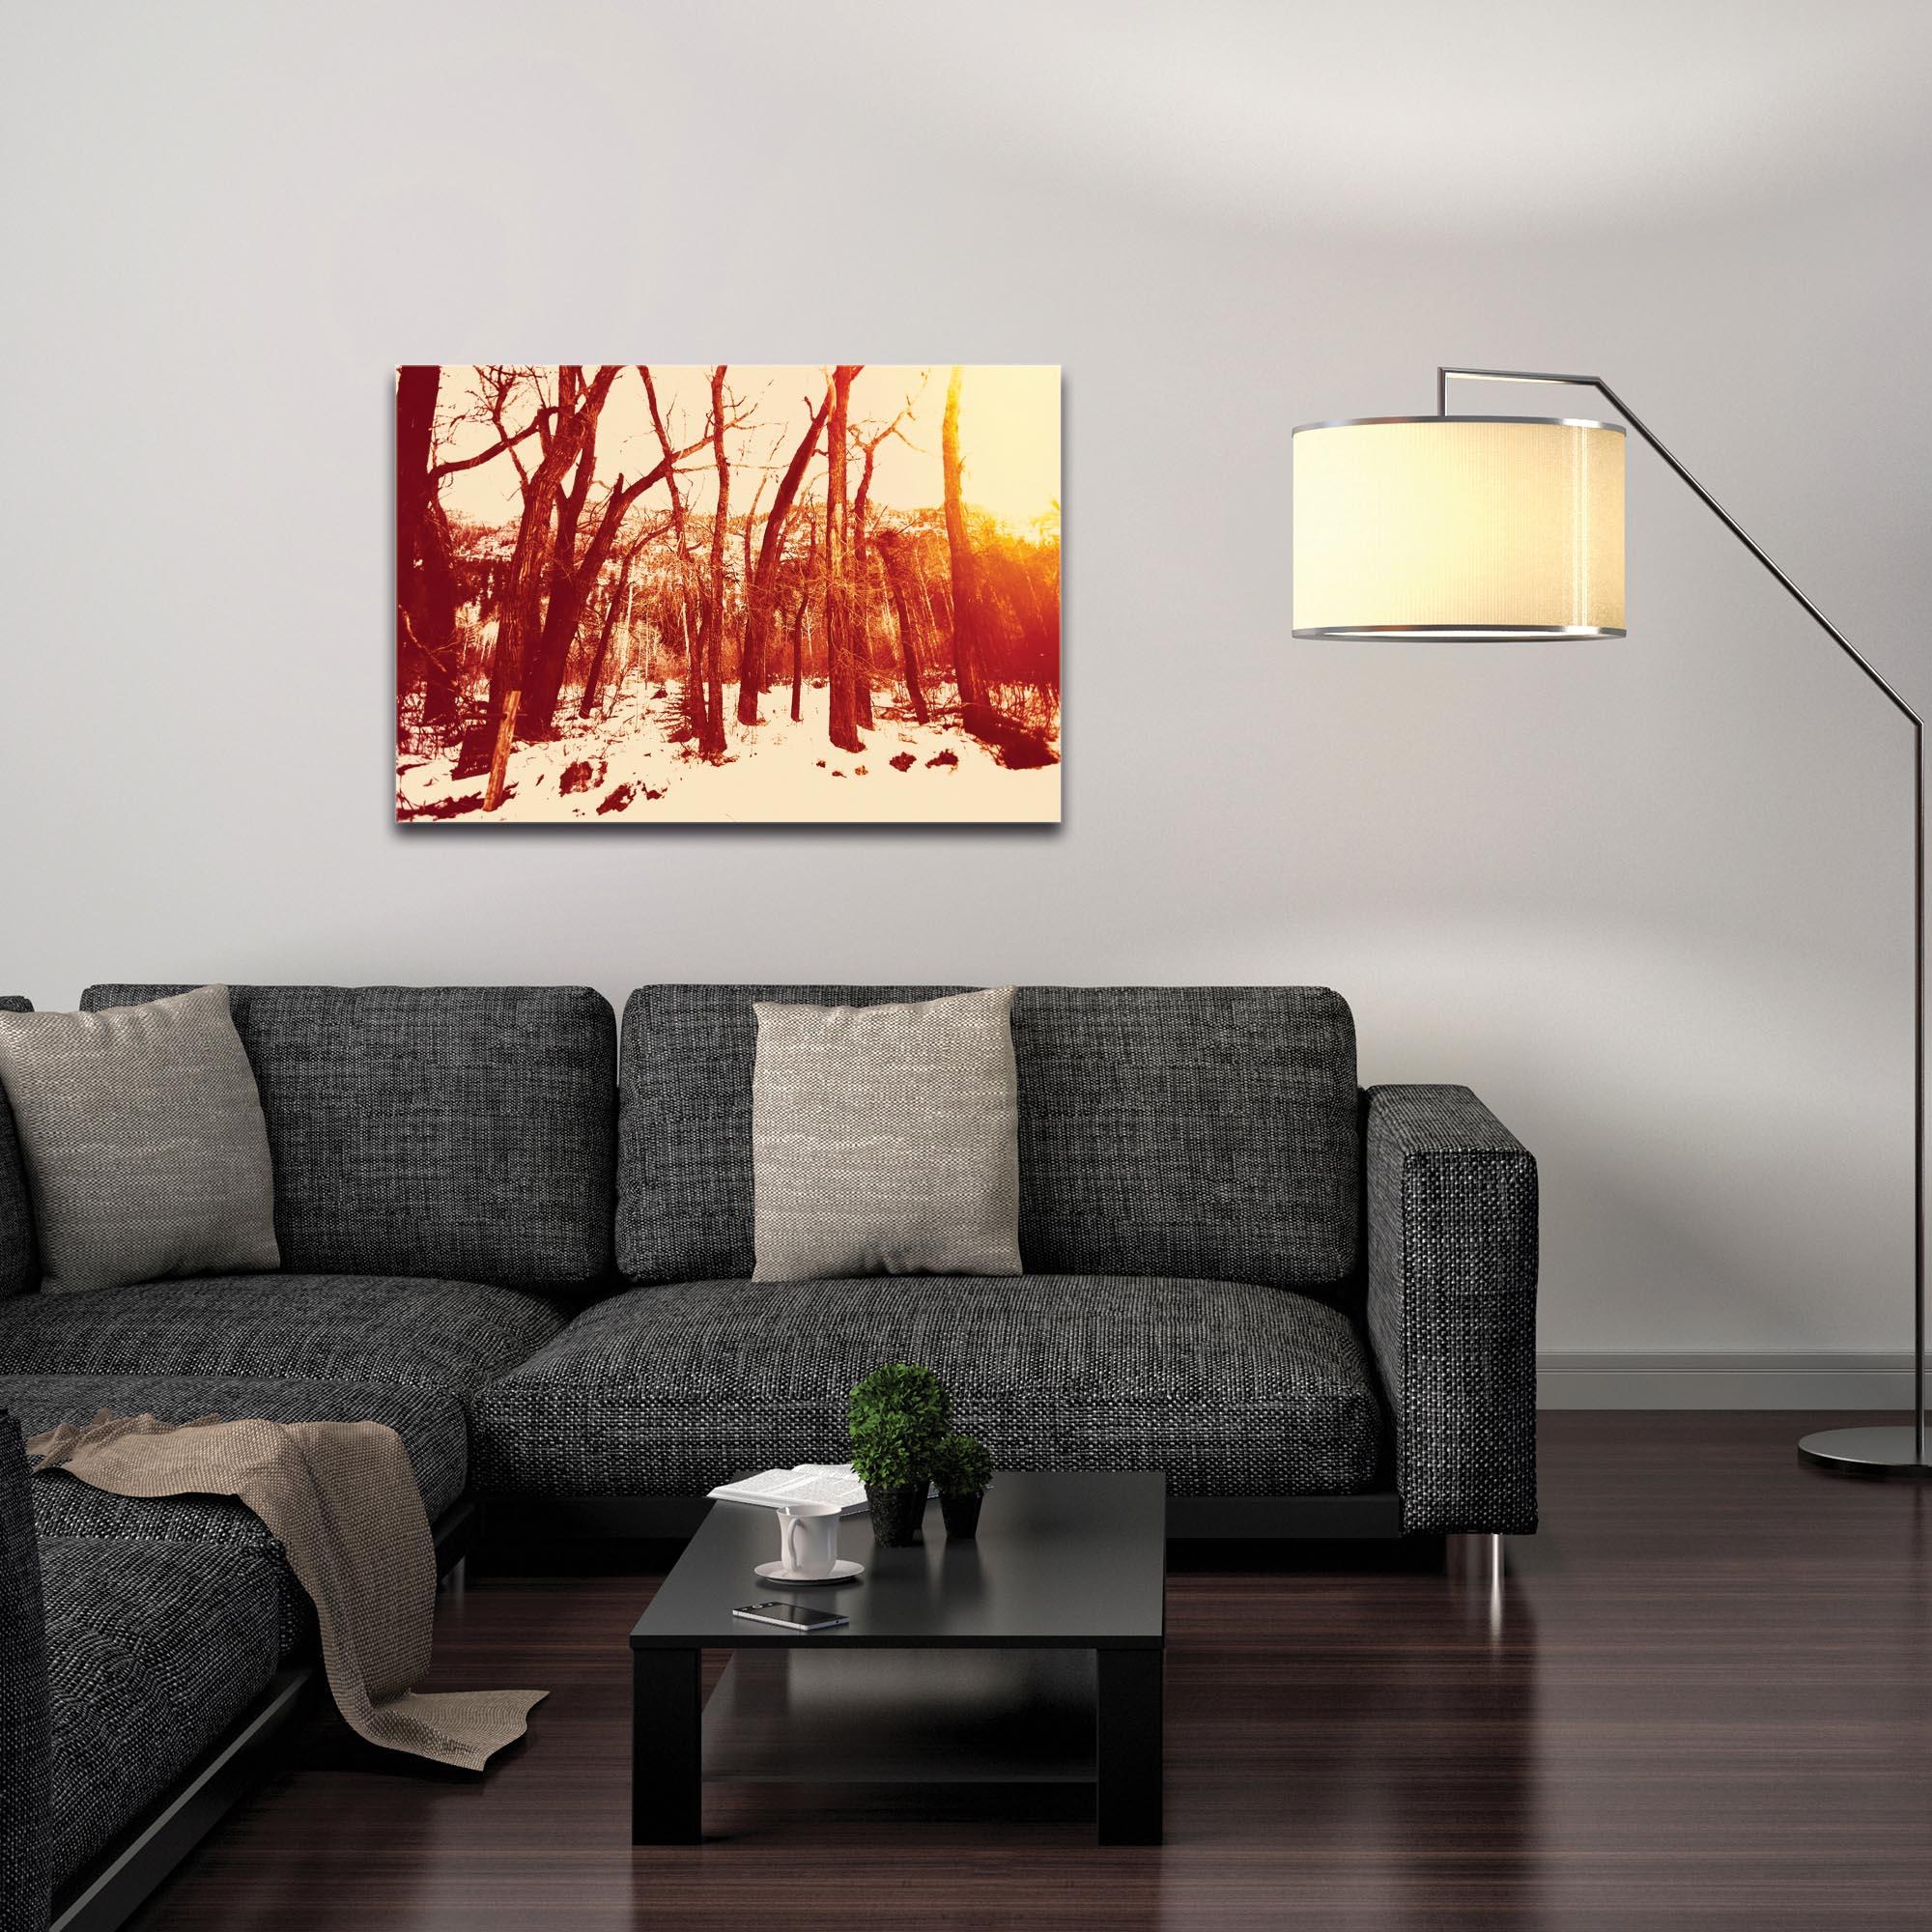 Landscape Photography 'Sepia Snowfall' - Winter Trees Art on Metal or Plexiglass - Image 3